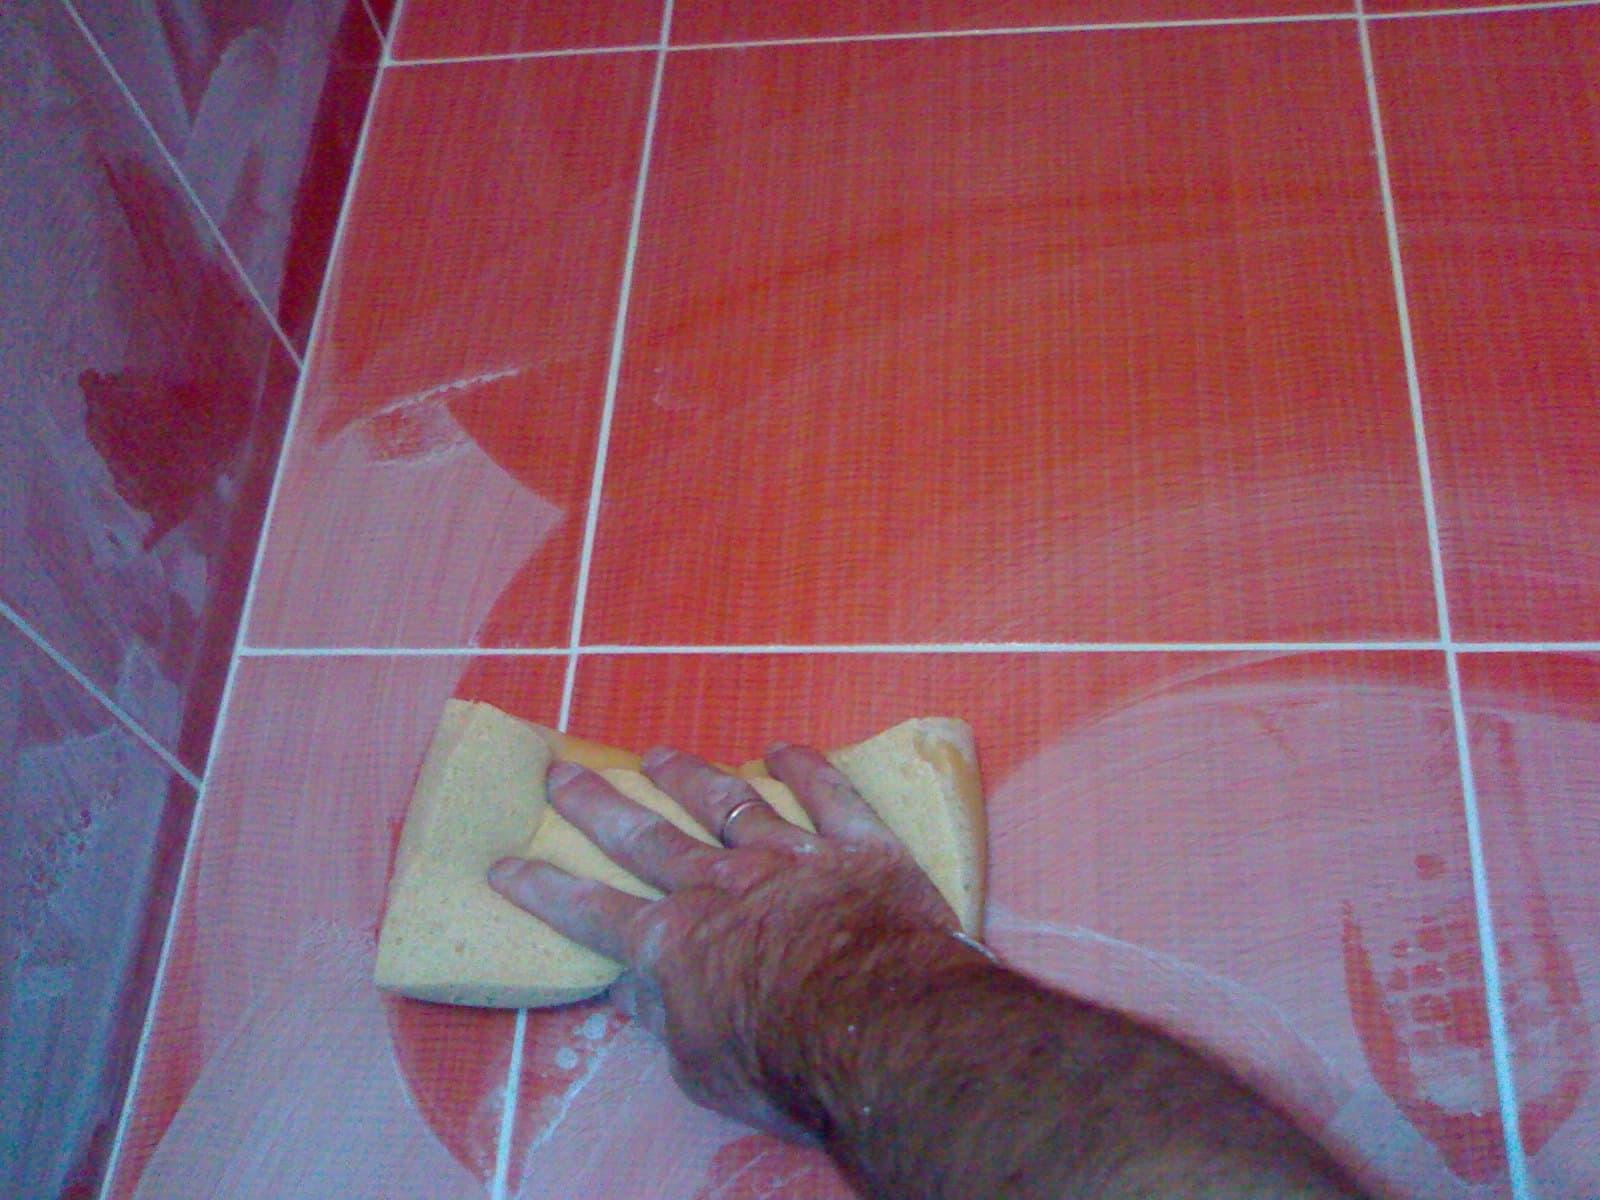 Удаление налета с поверхности плитки